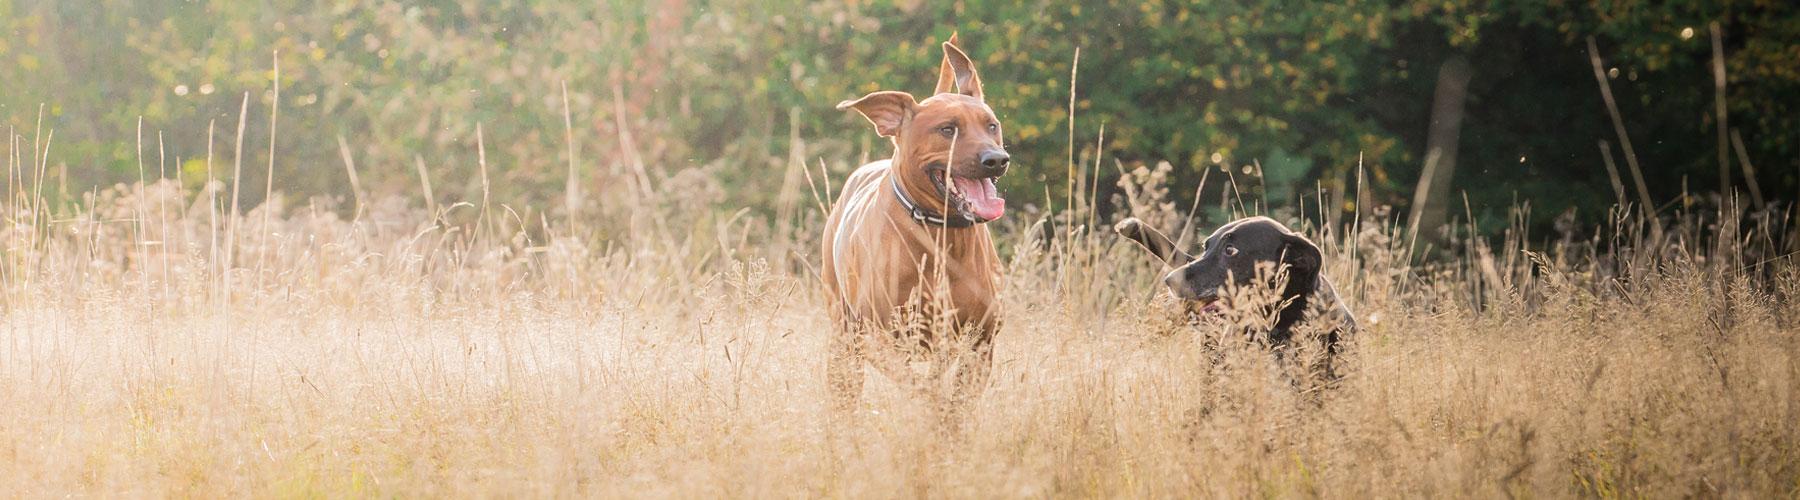 Dog-Walking-Header